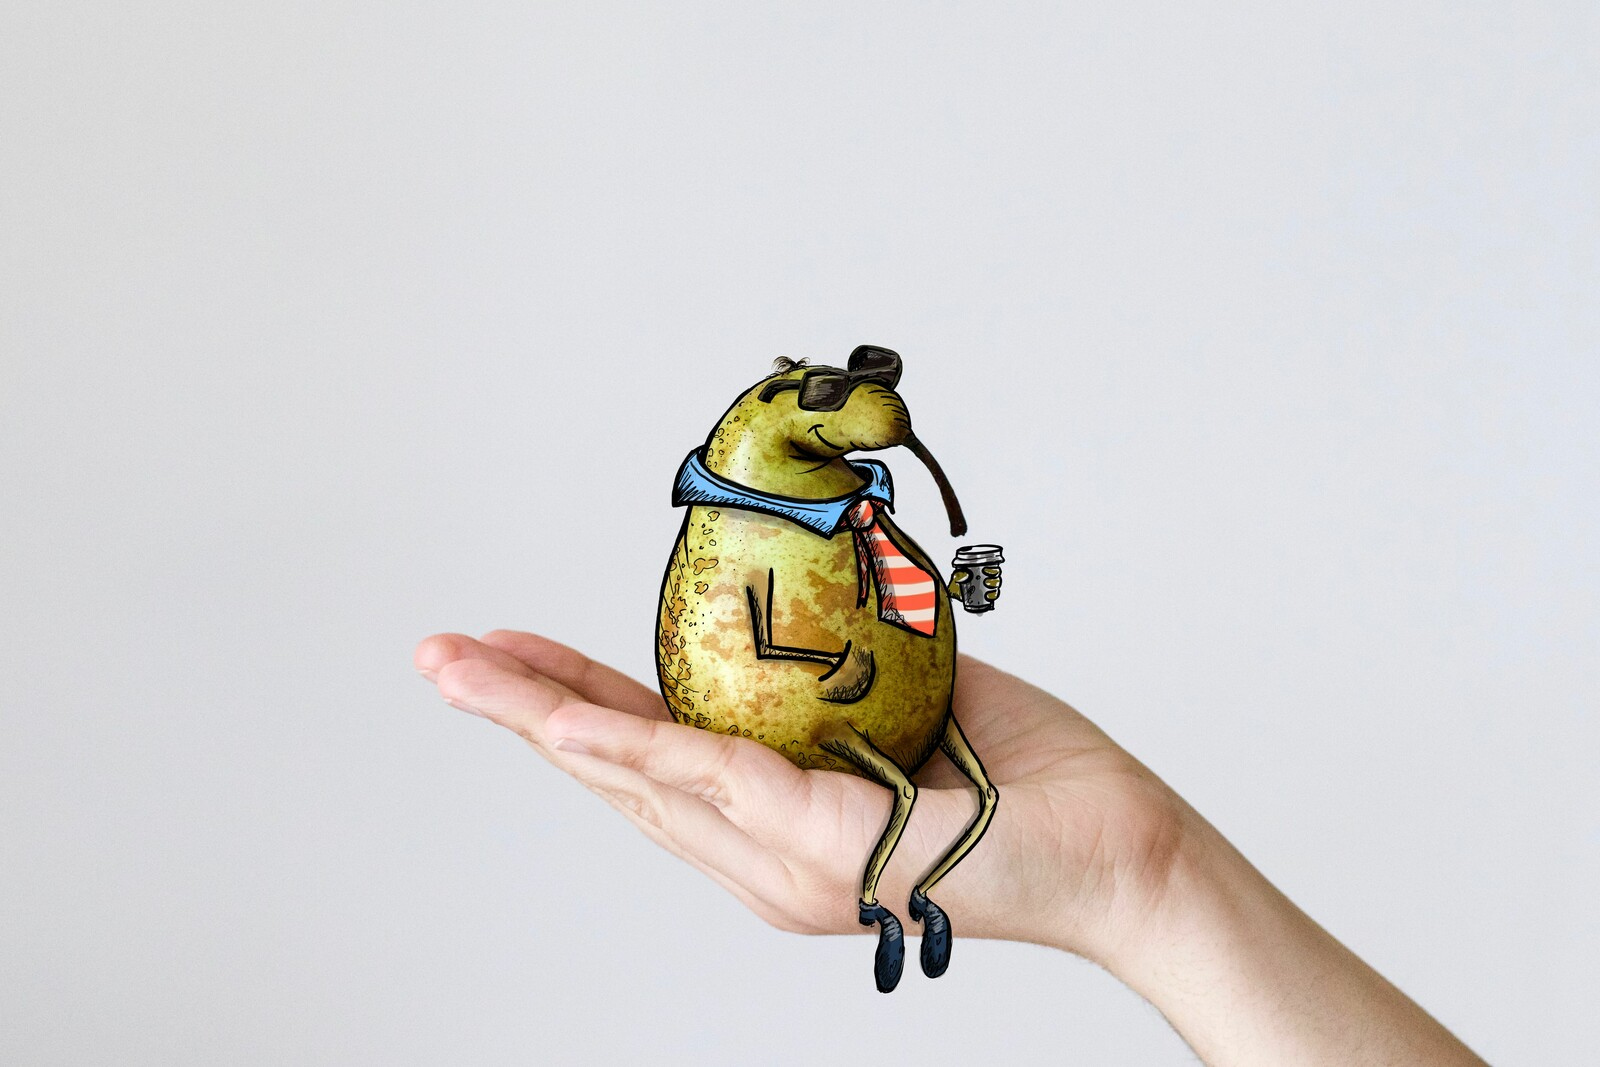 Mr. Pear Creature